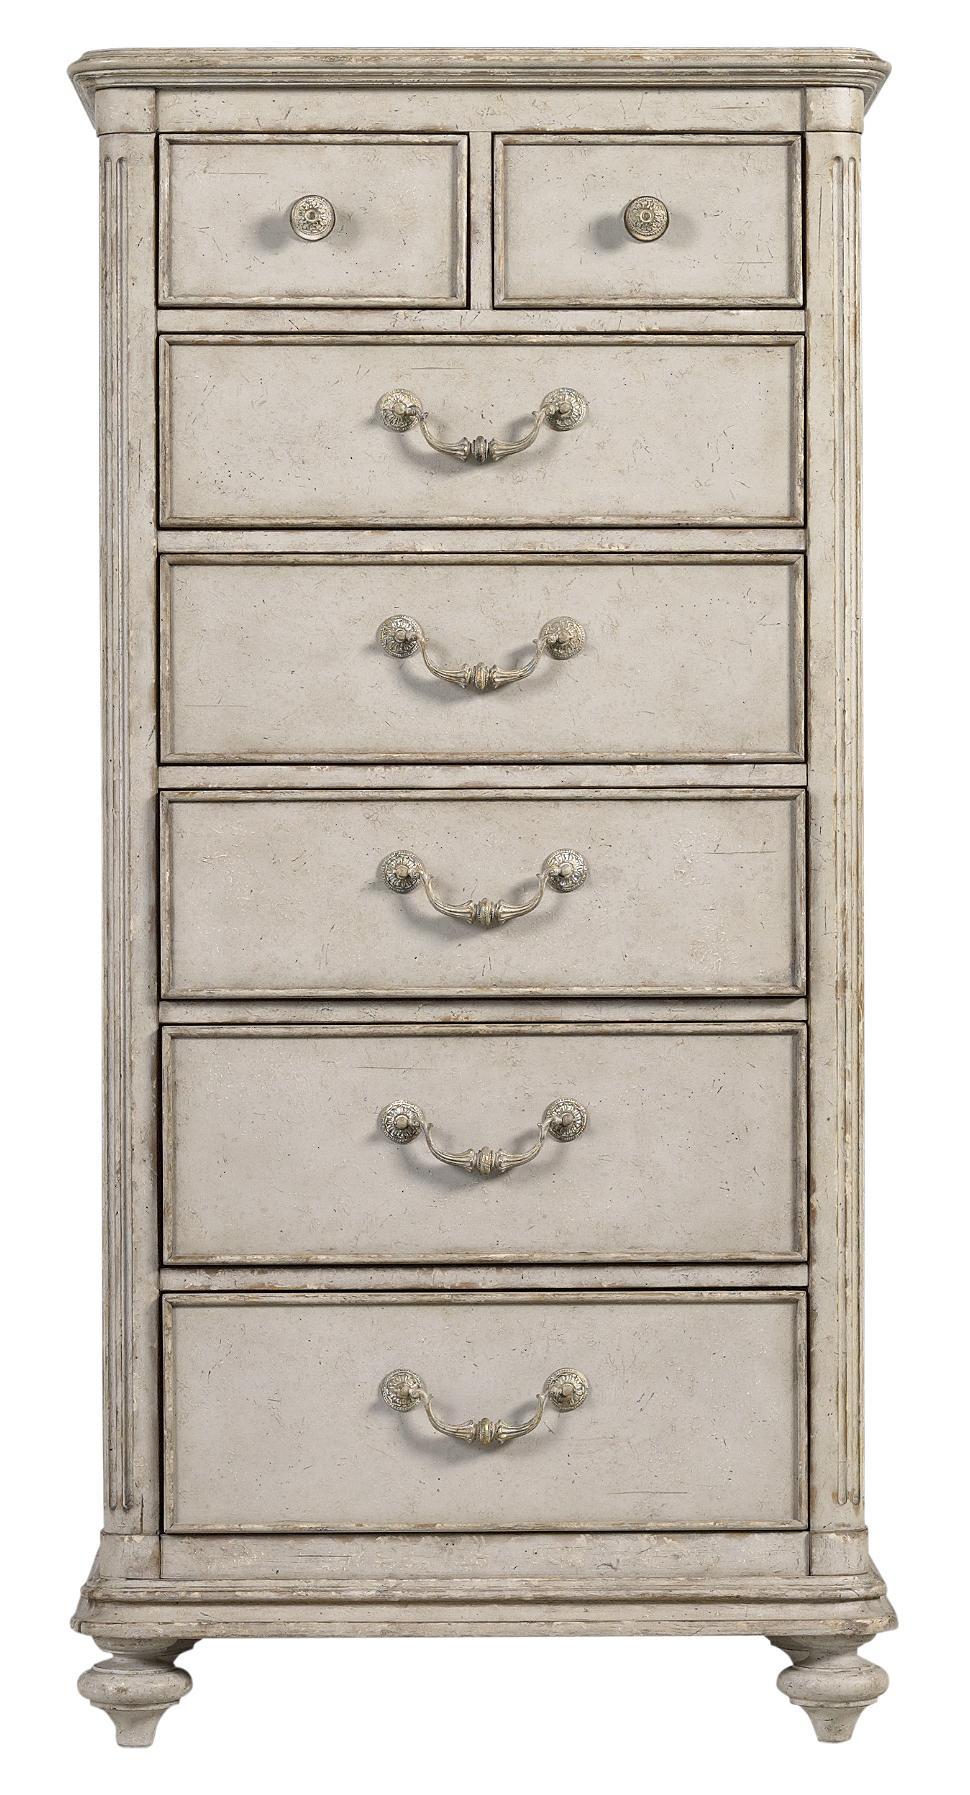 Stanley Furniture Arrondissement Belle Mode Lingerie Chest - Item Number: 222-23-12